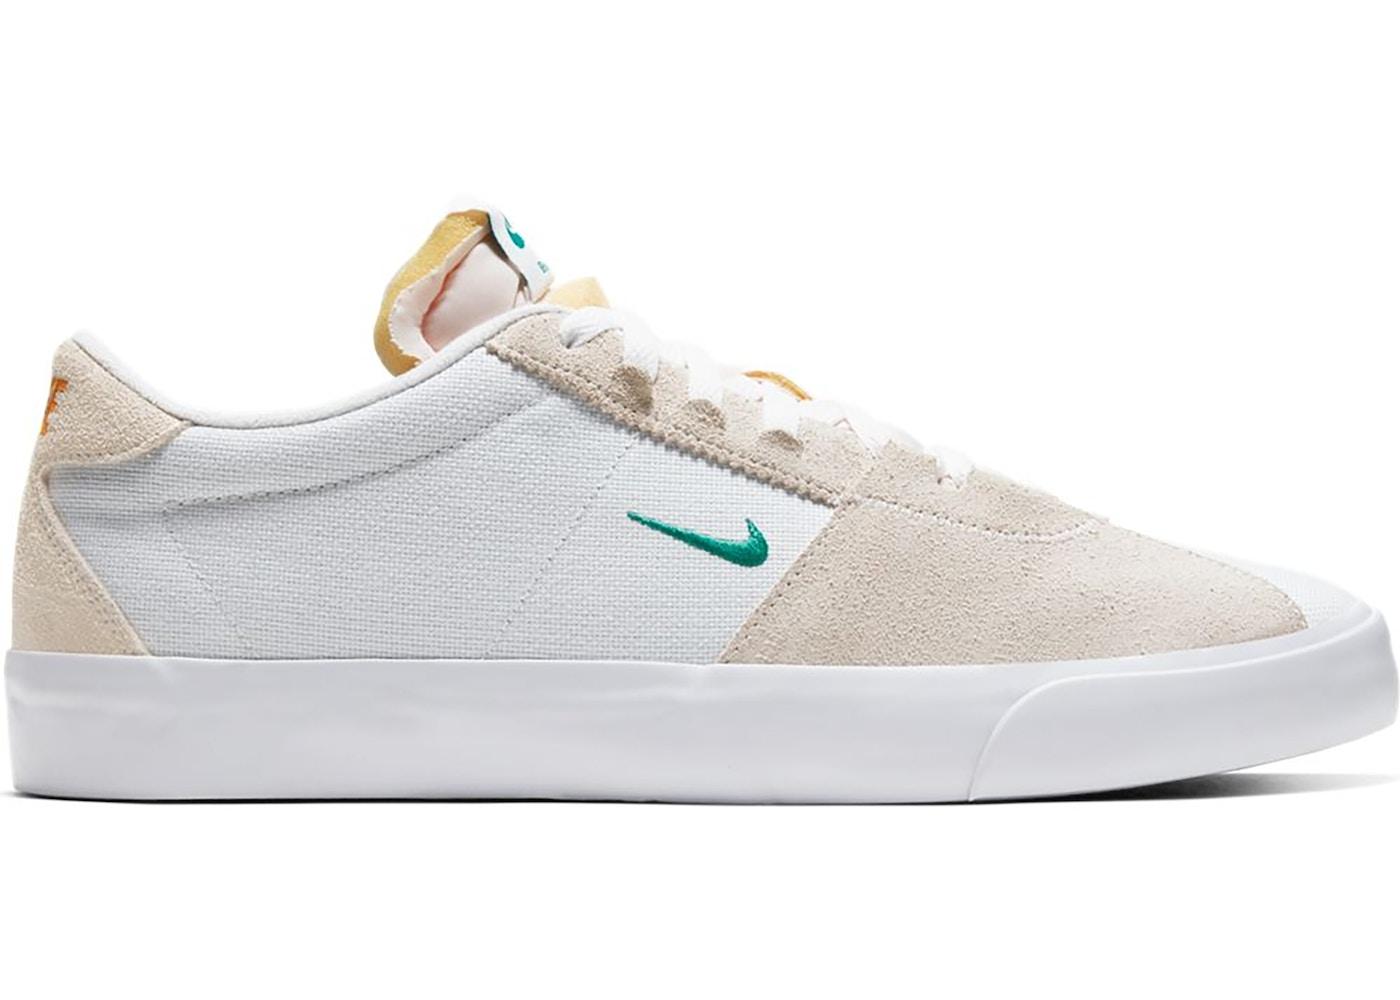 Nike SB Air Zoom Bruin Edge White Neptune Green